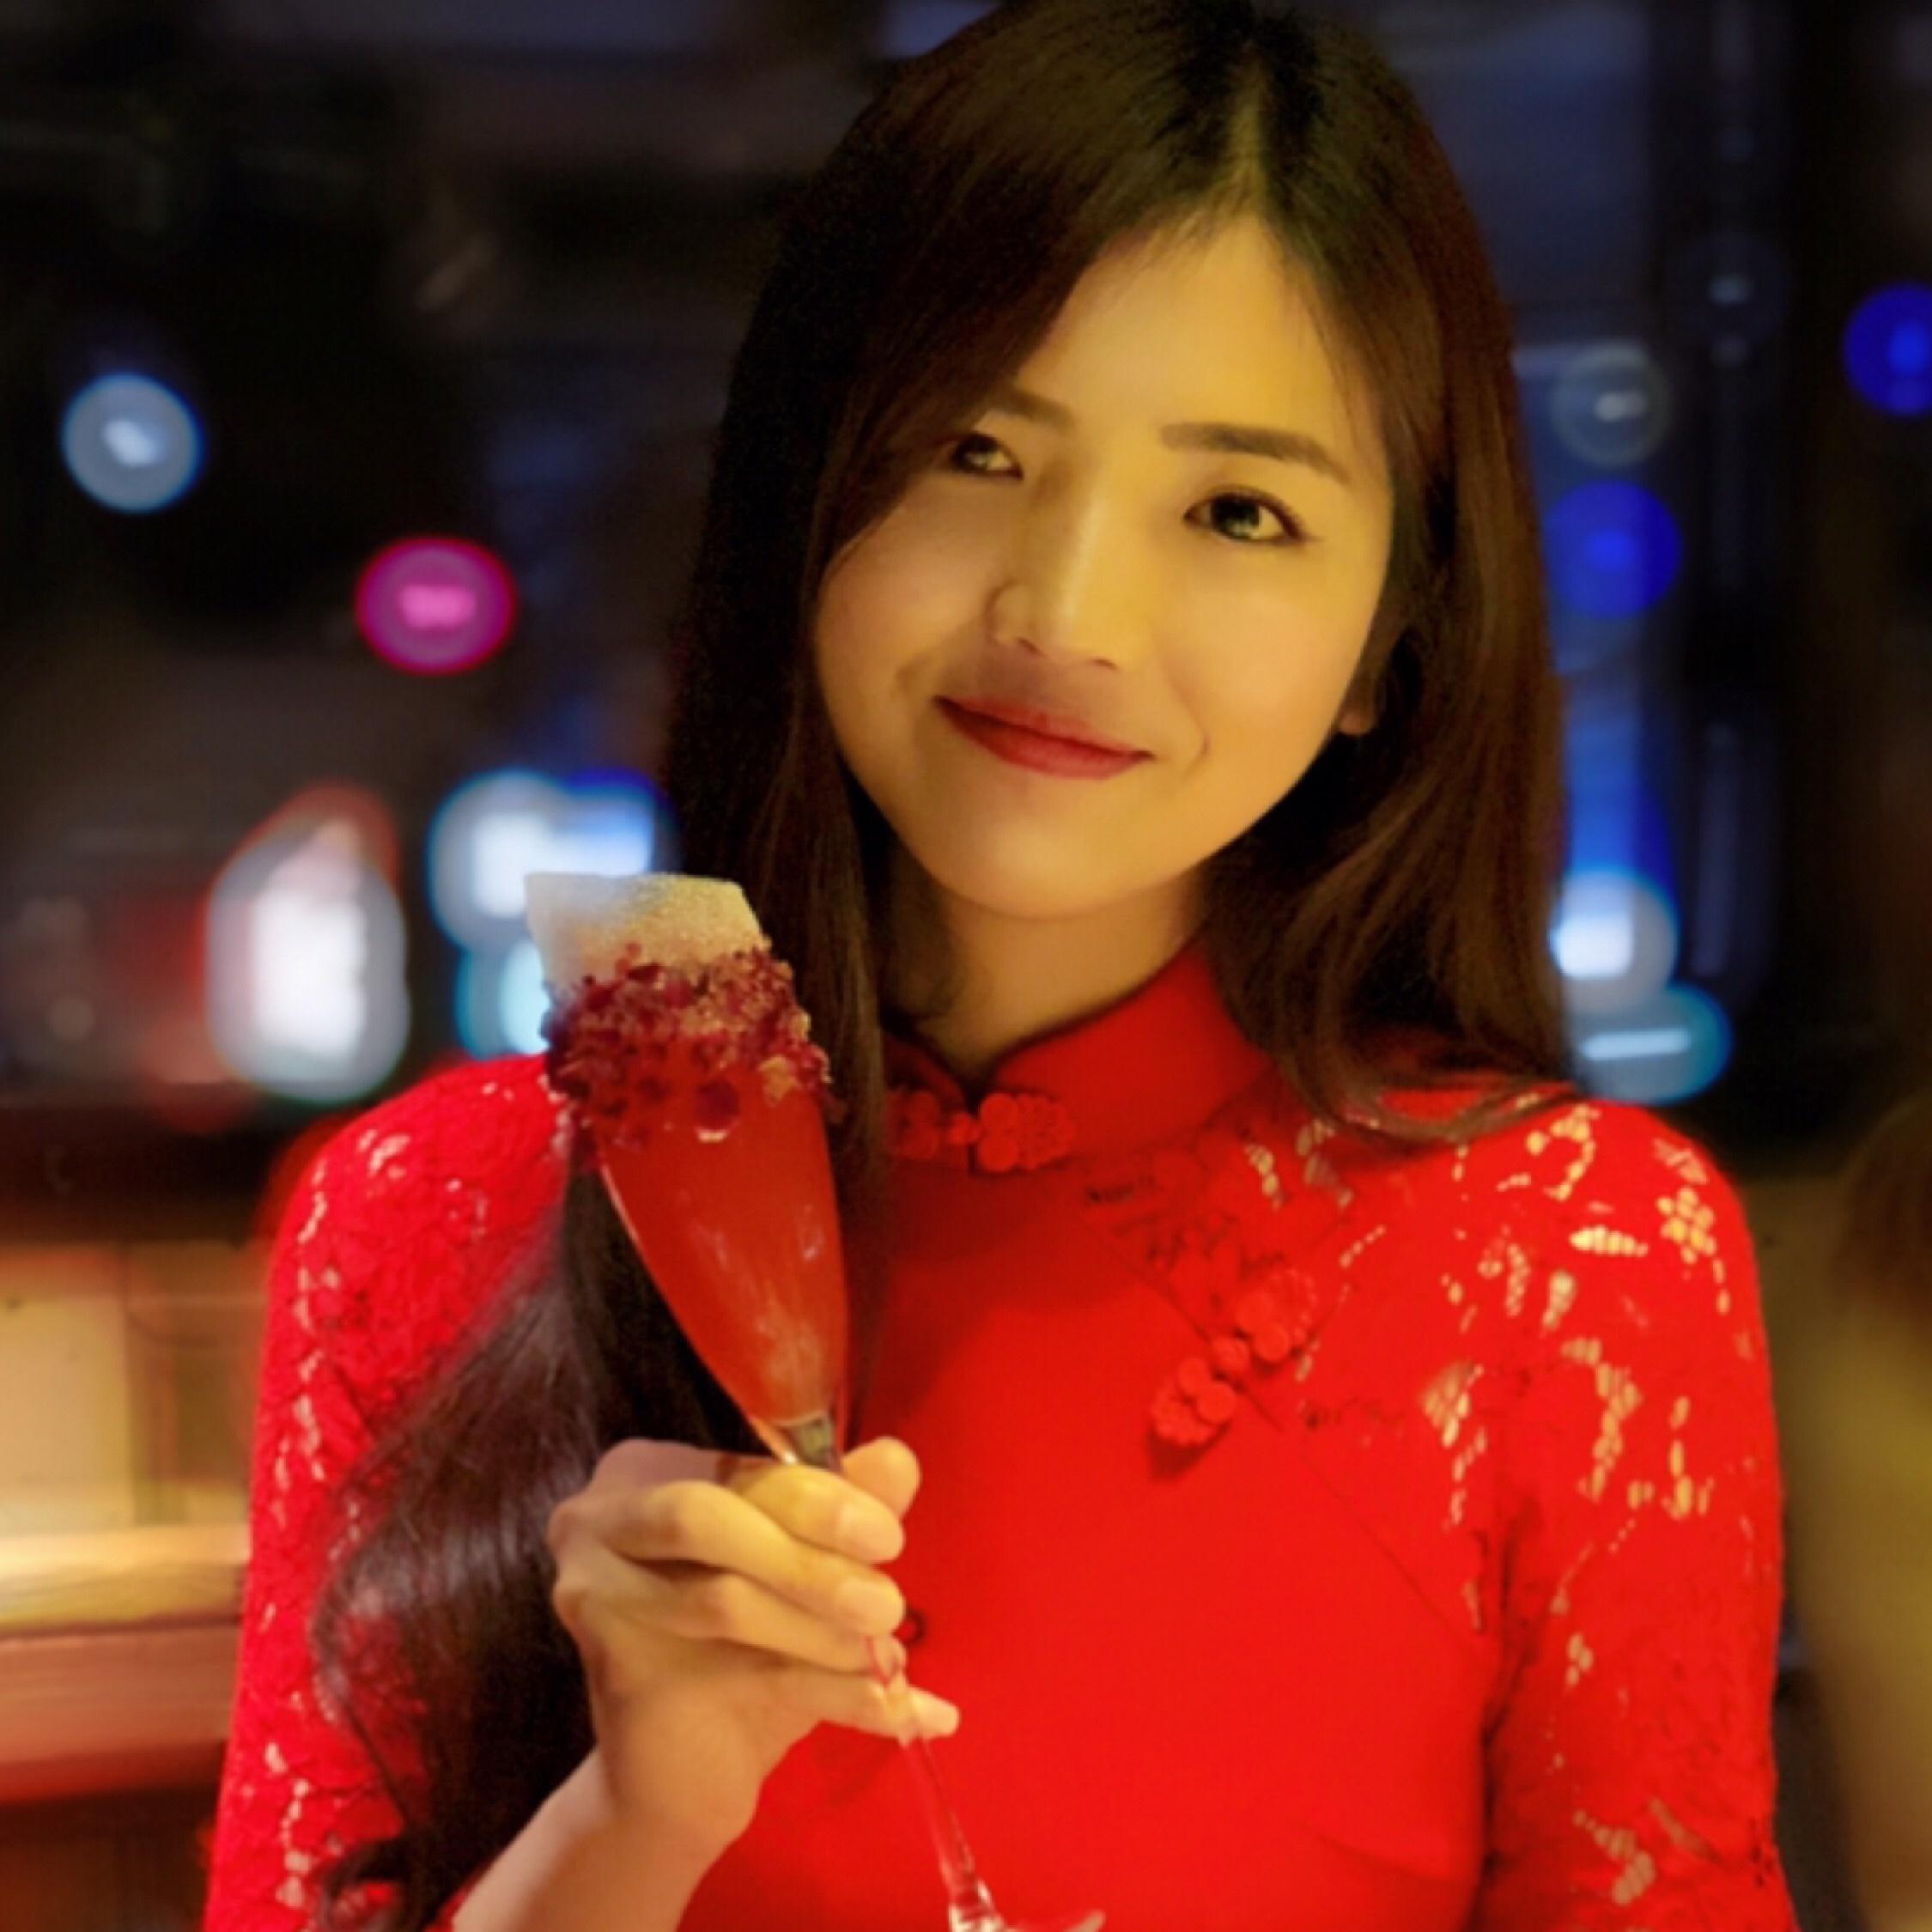 Miss_沙粒